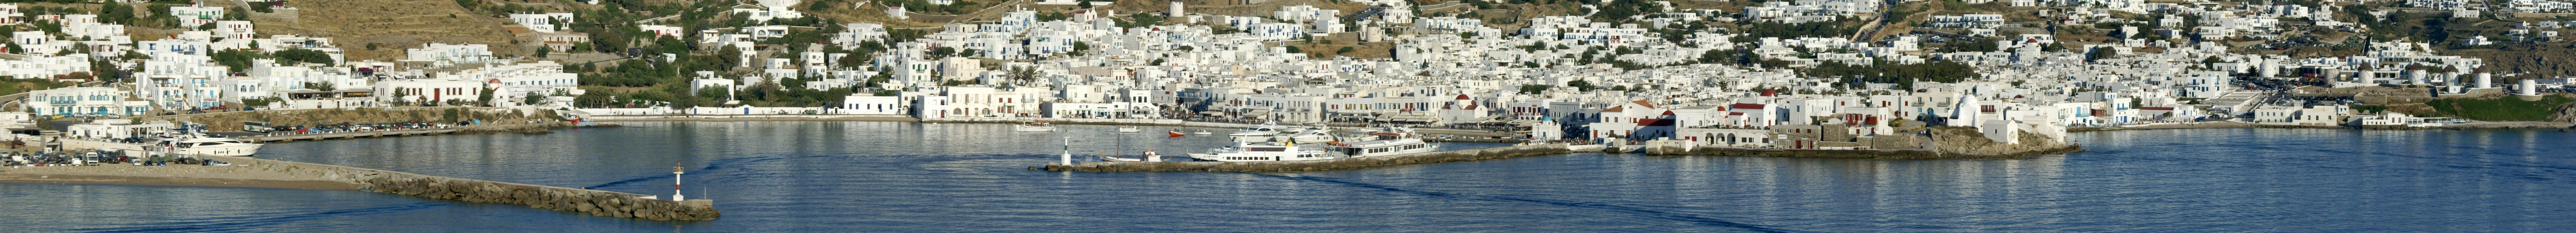 fähren mykonos naxos